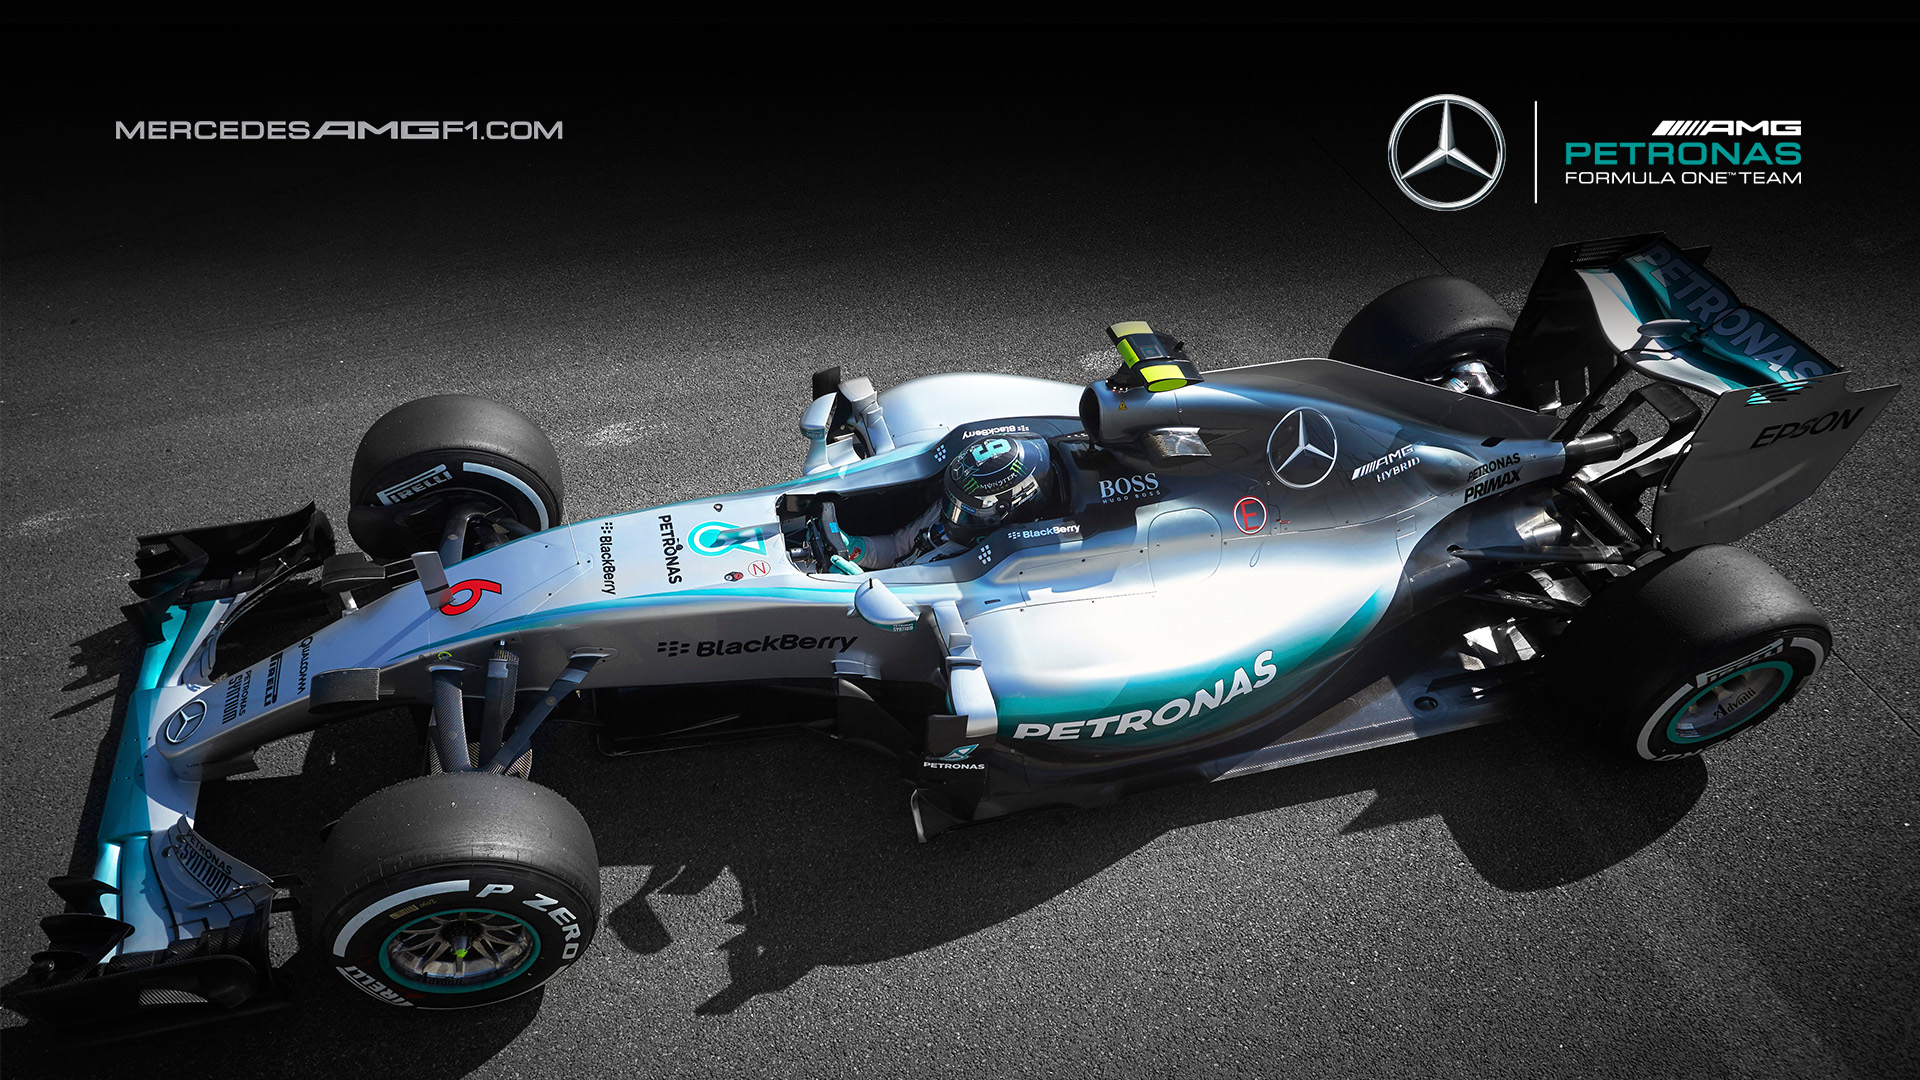 Mercedes f1 w08 wallpaper 11